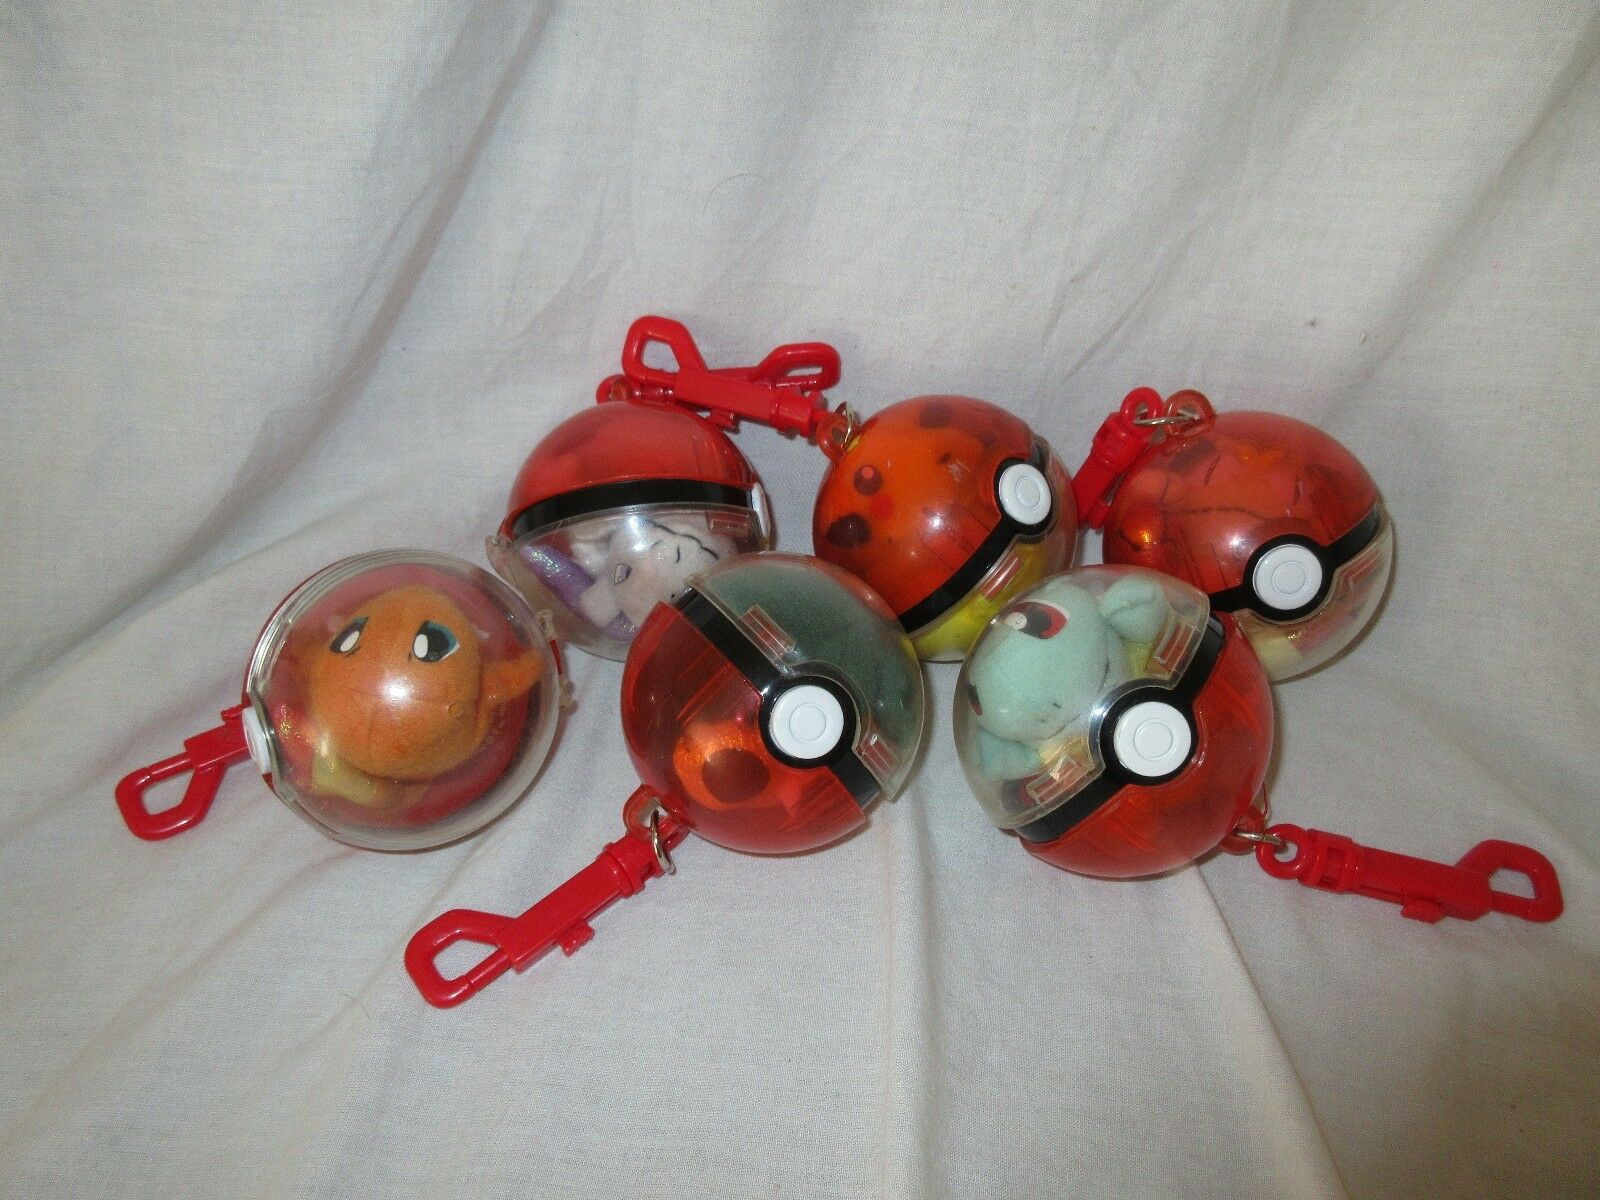 Applause Pokemon 1998 pokeball x6, Meowth Pikachu snorlax  Mewtwo charizard